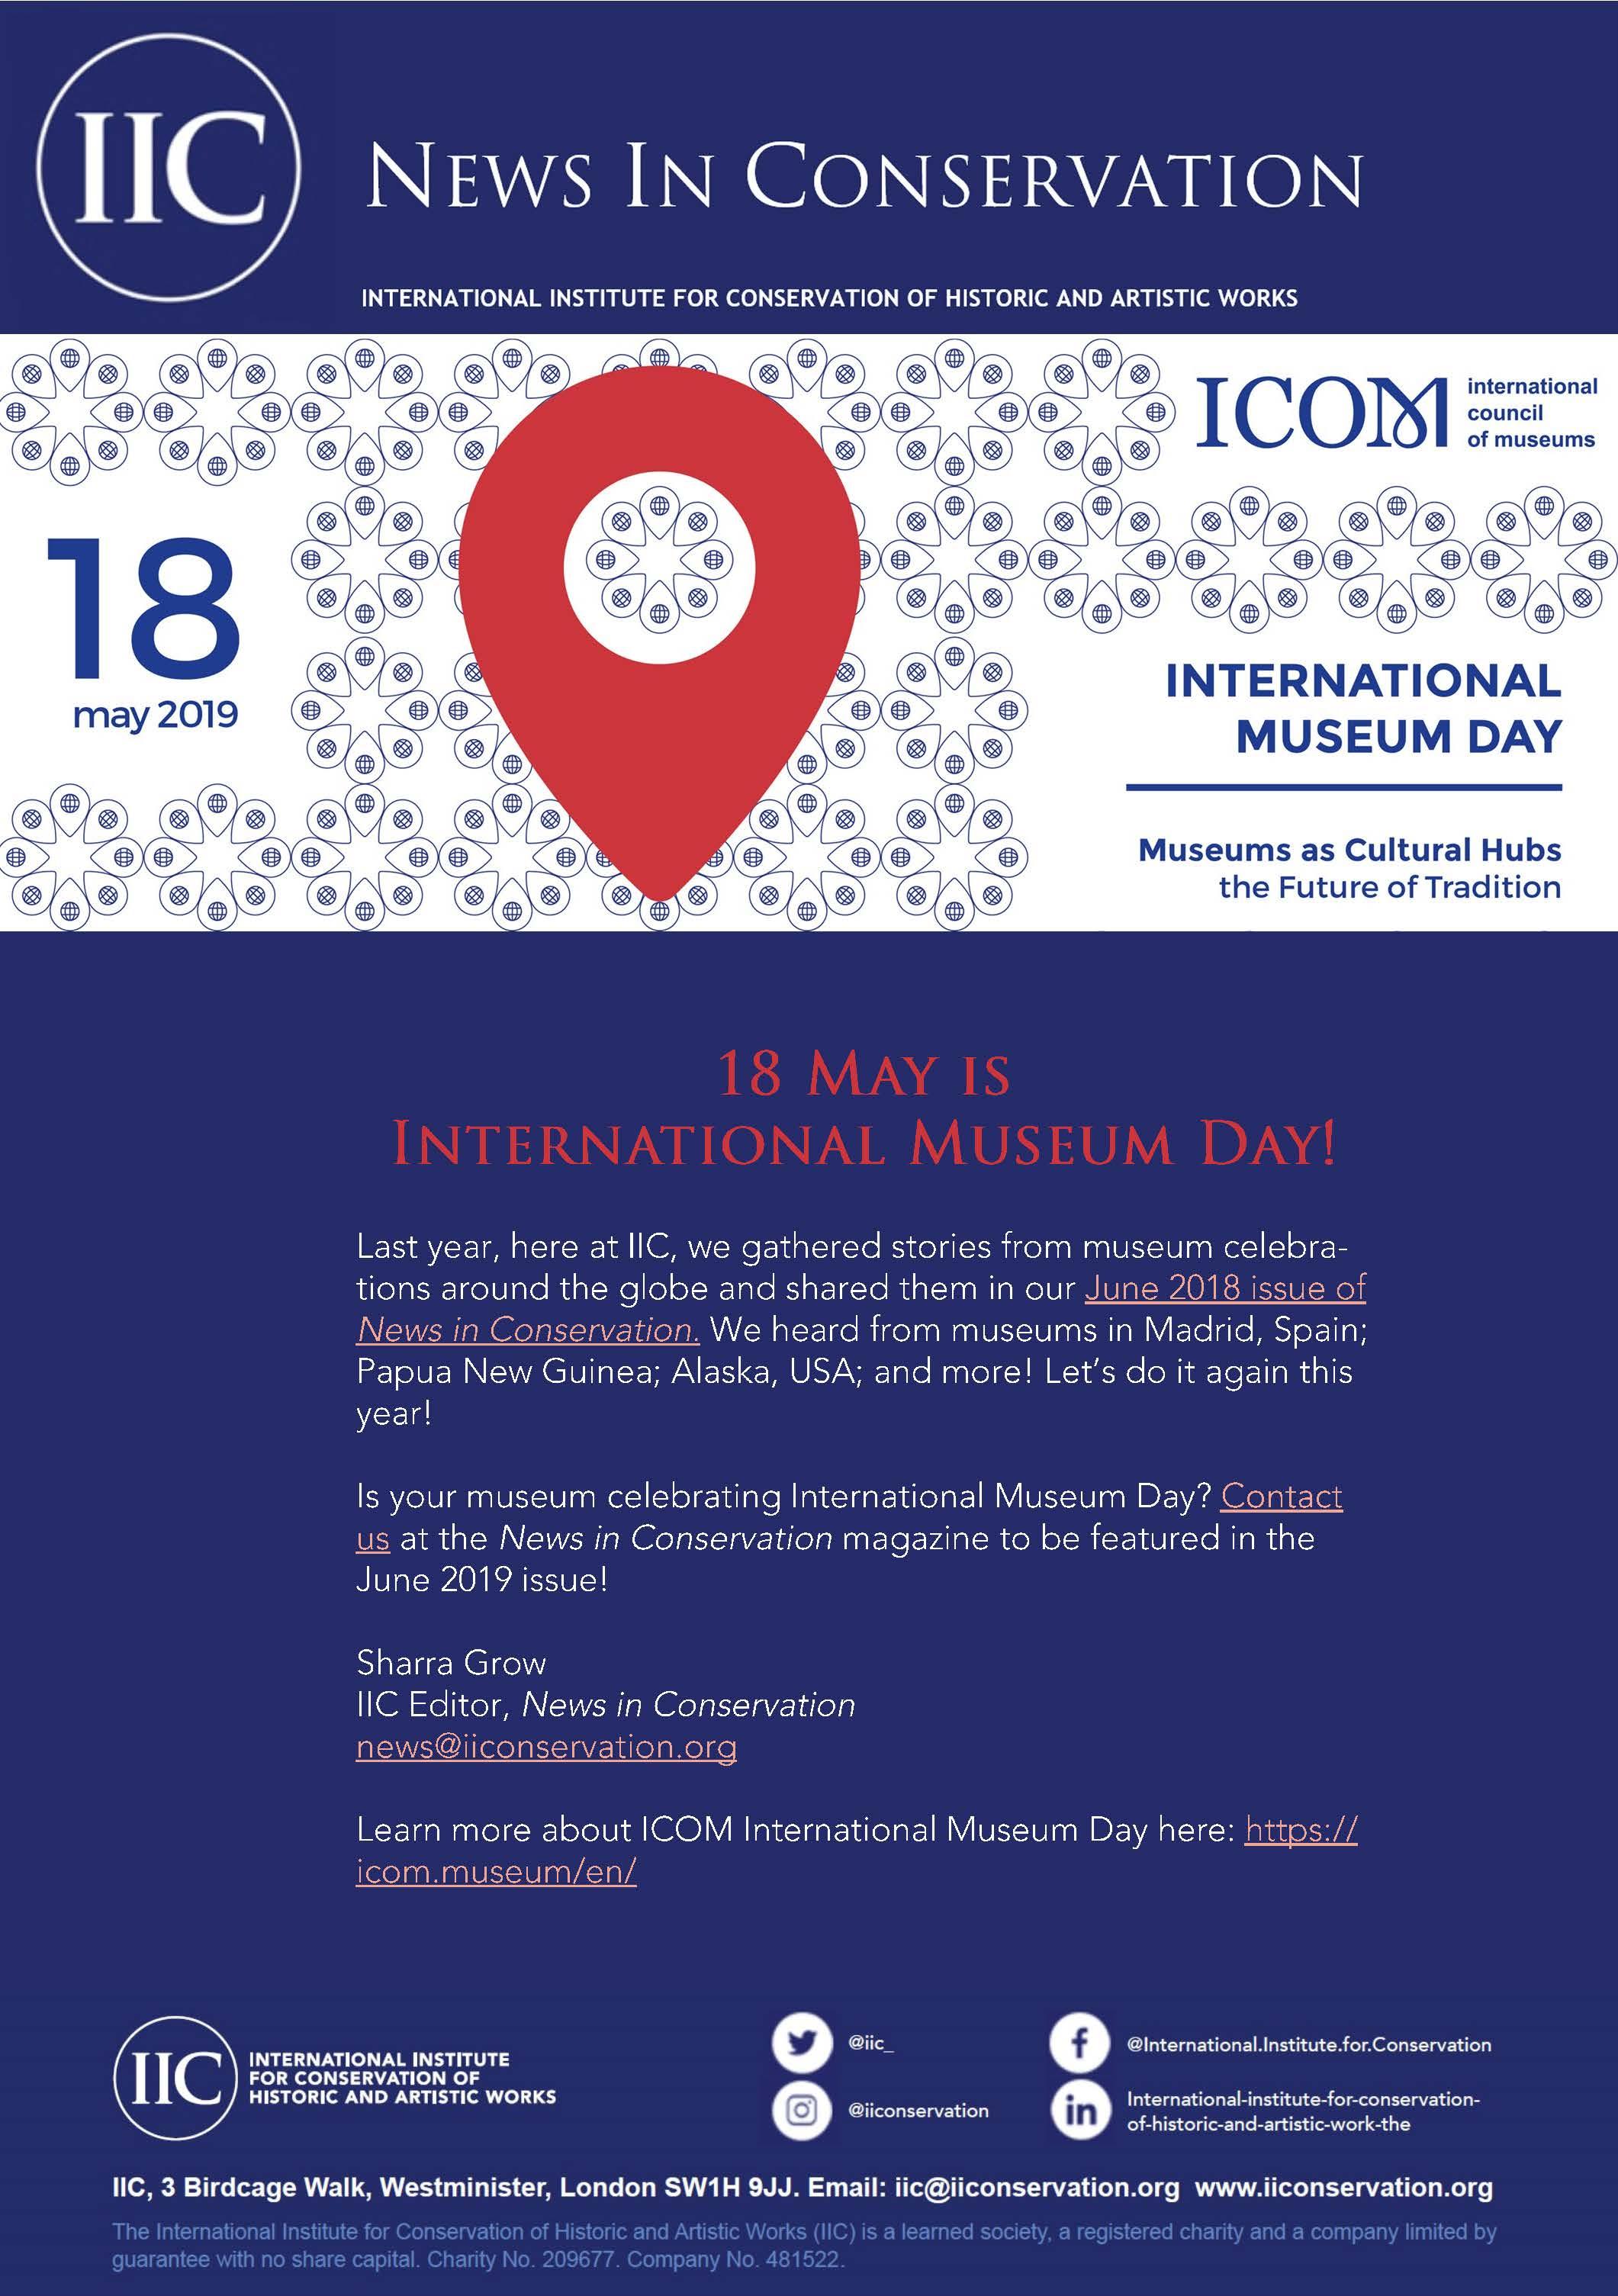 International Museum Day 2019 Poster